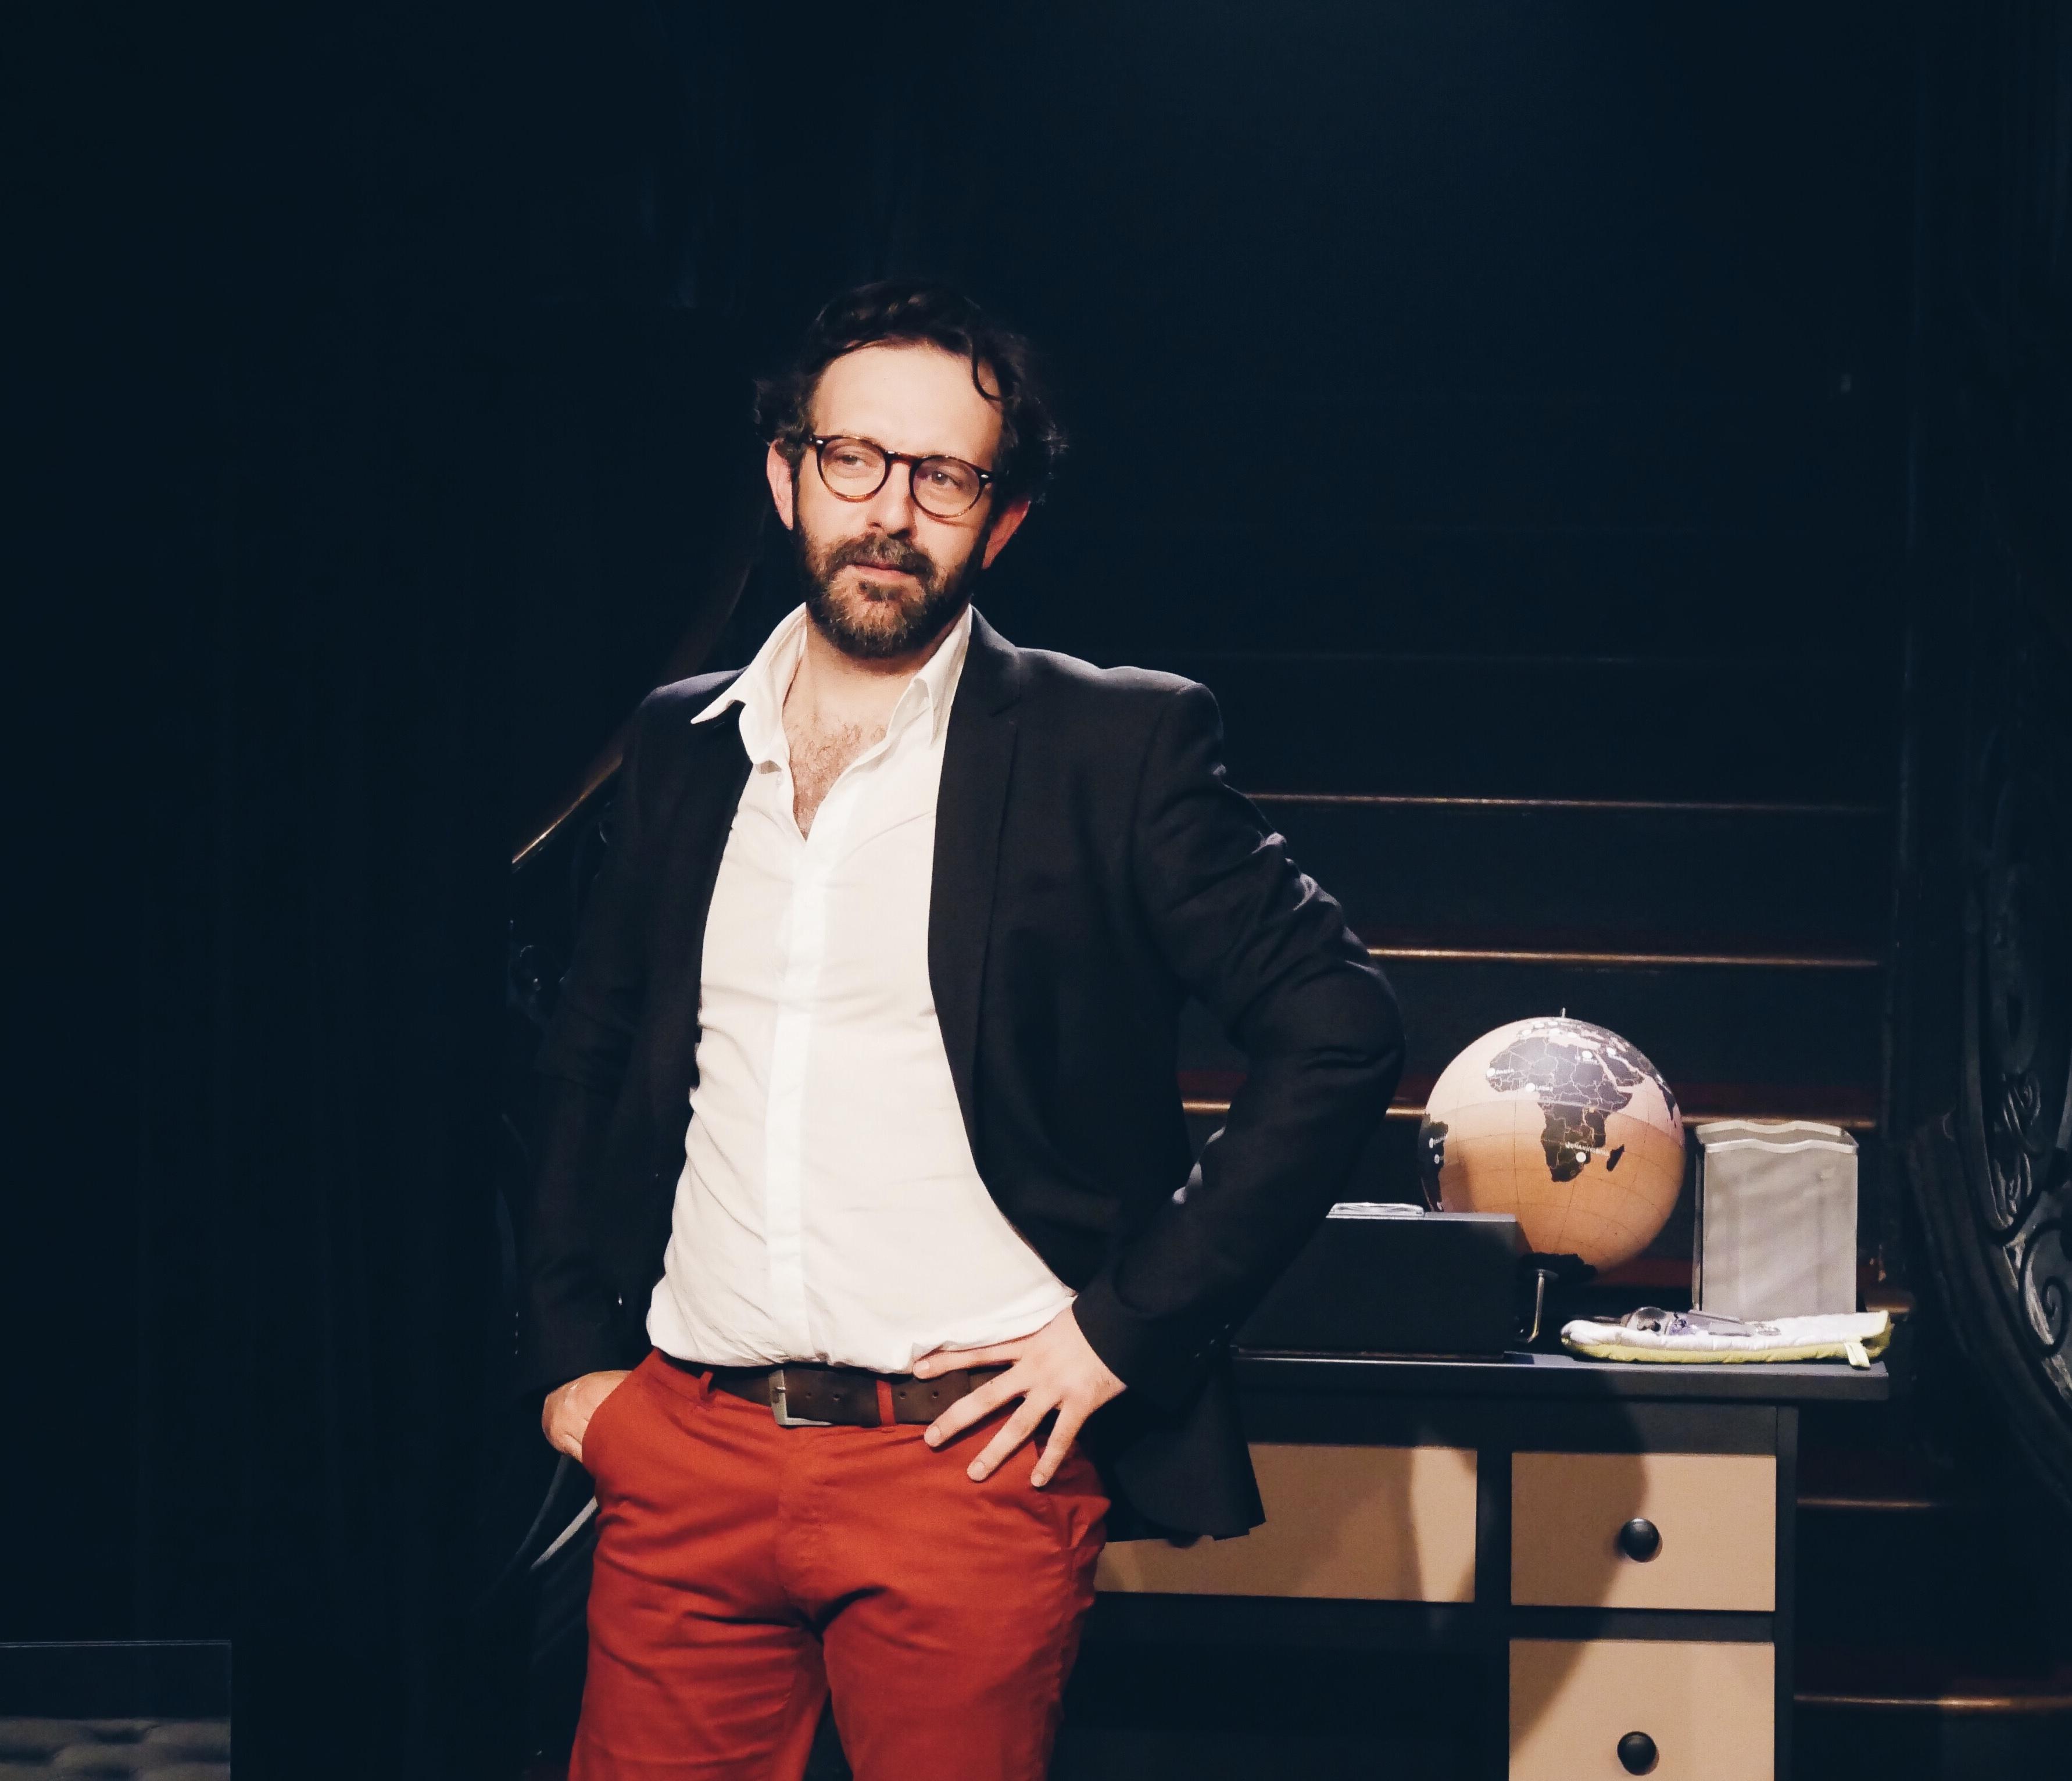 François Martinez